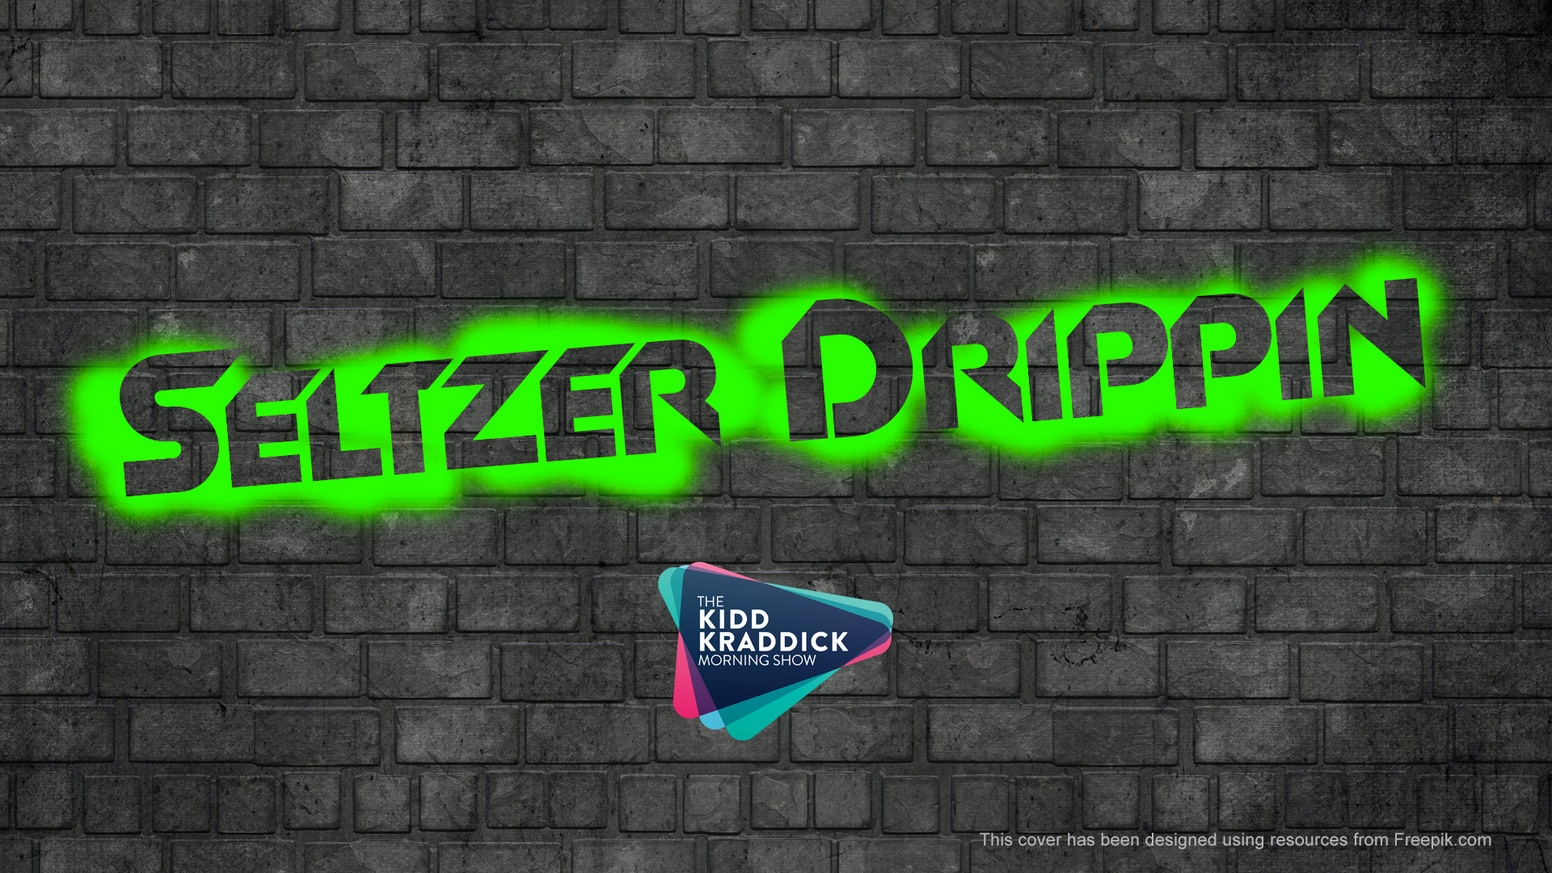 Seltzer Drippin' Music Video by The Kidd Kraddick Morning